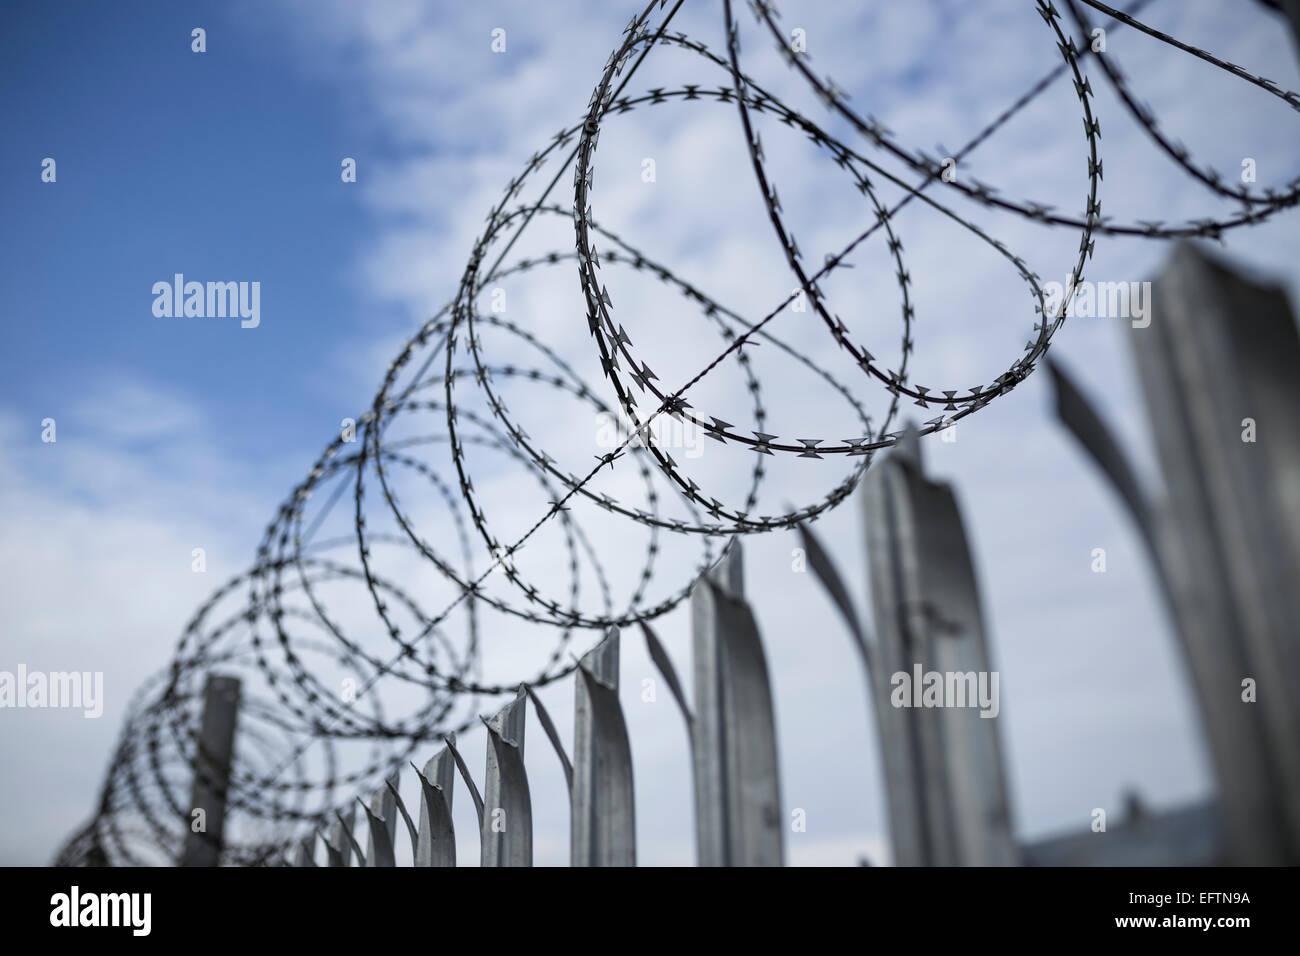 Razor Wire Fence Stock Photos & Razor Wire Fence Stock Images - Alamy